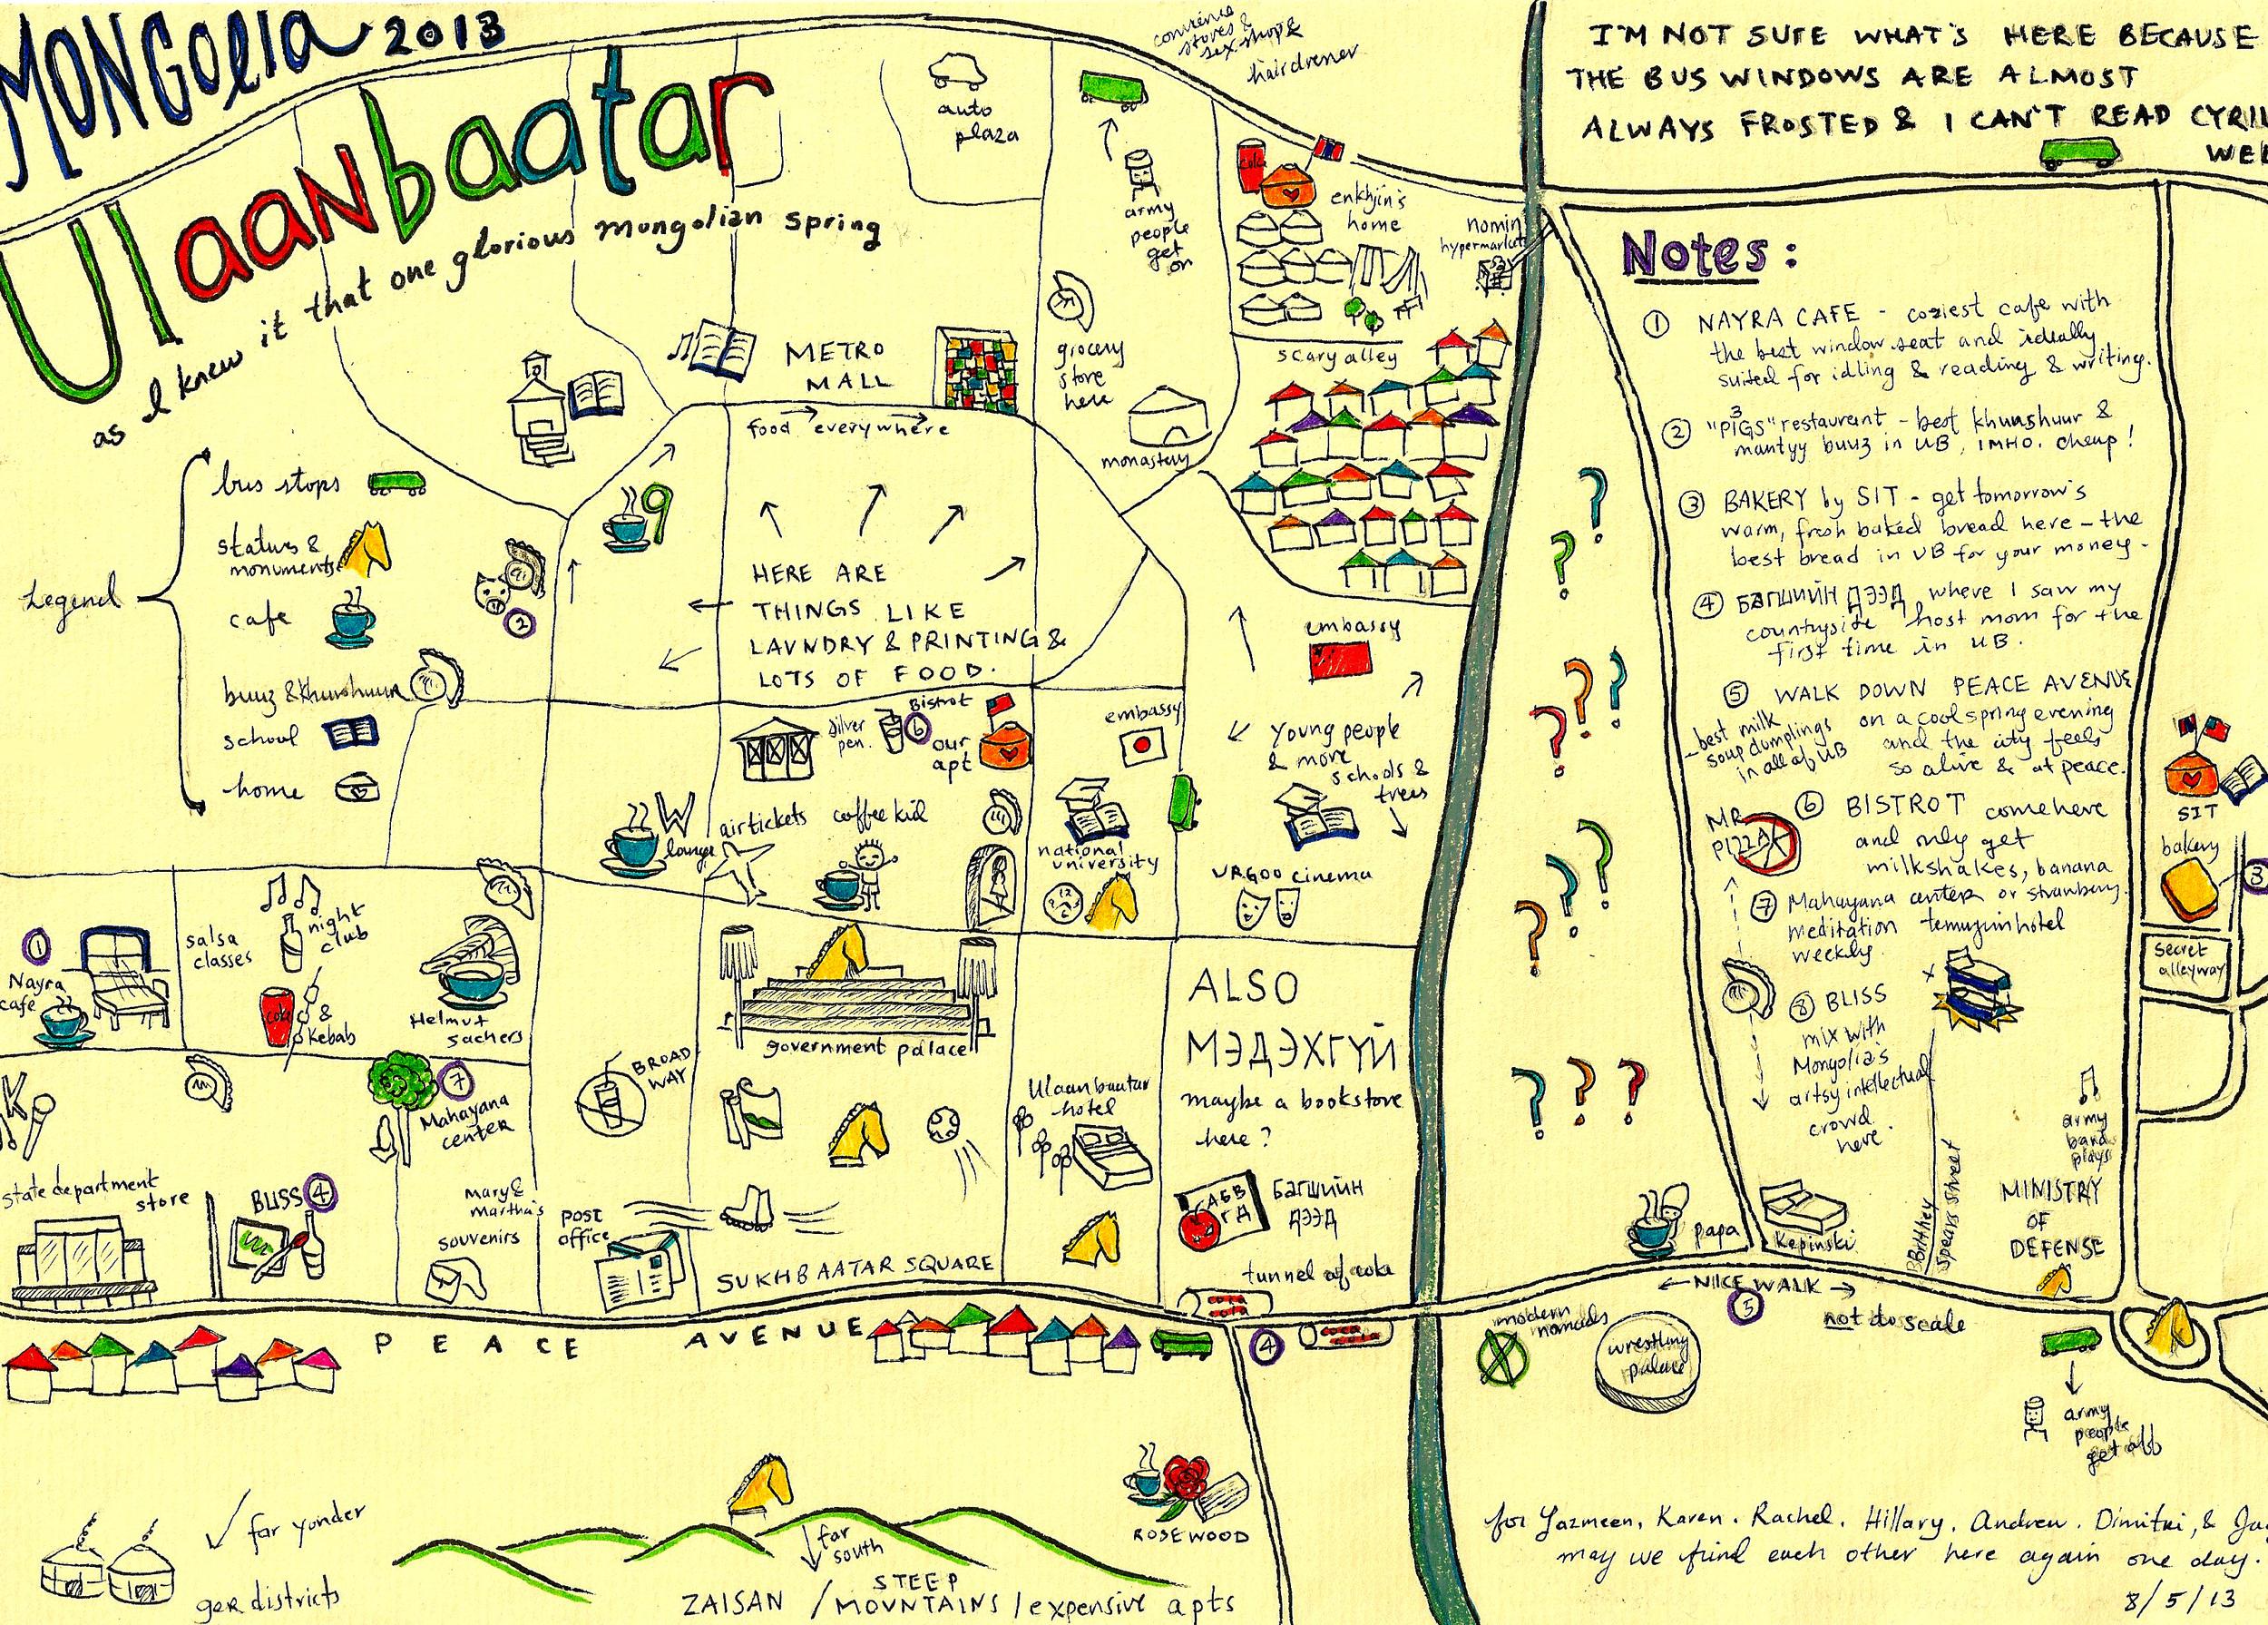 ulaanbaatar mapped by kening, 2013